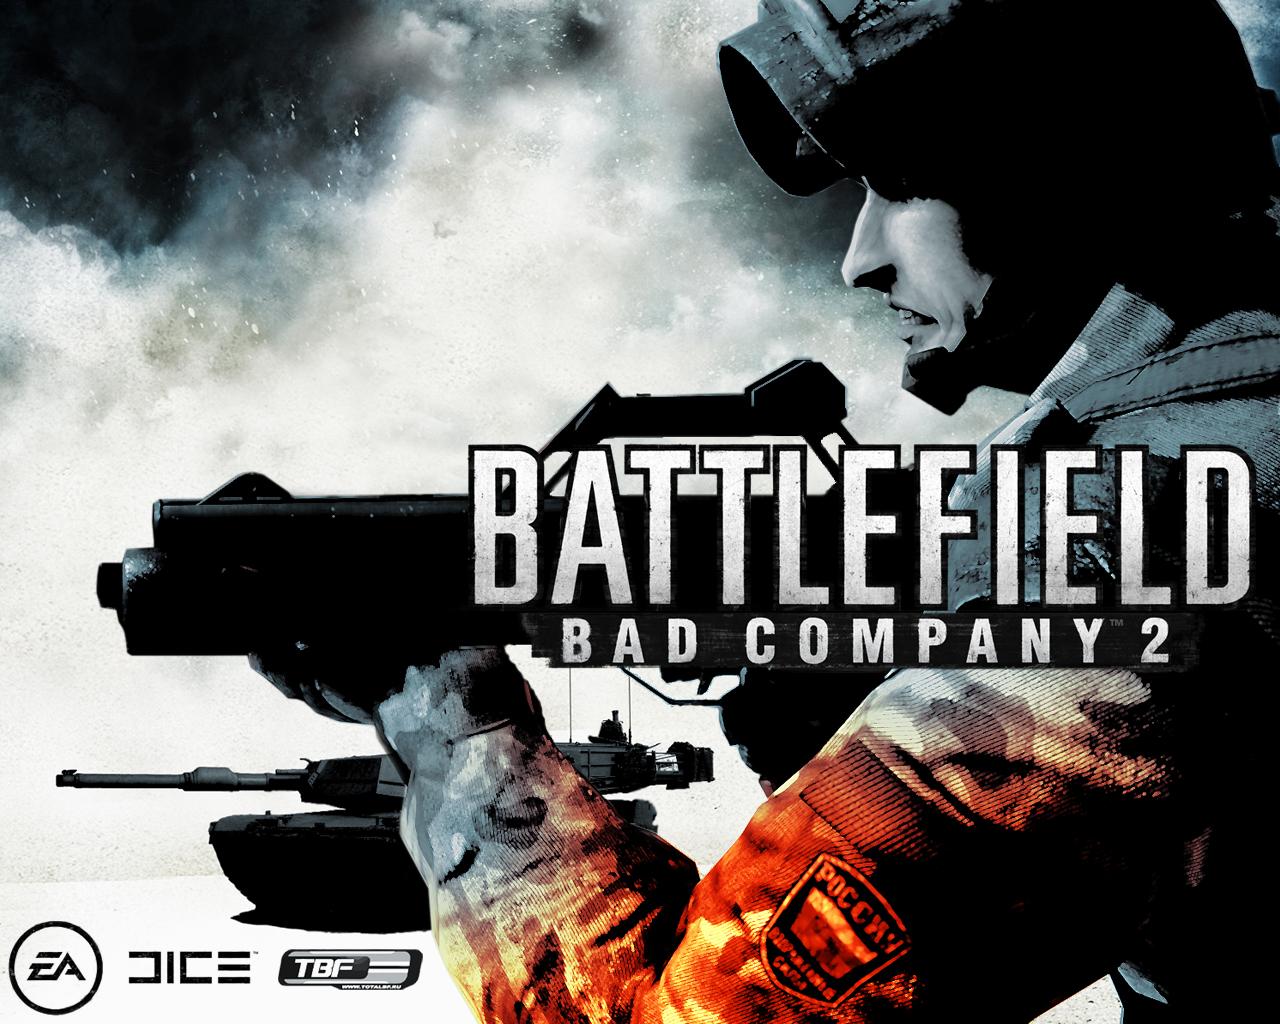 Cyber Game Wallpaper Battlefield Bad Company 2 HD Wallpaper 1280x1024